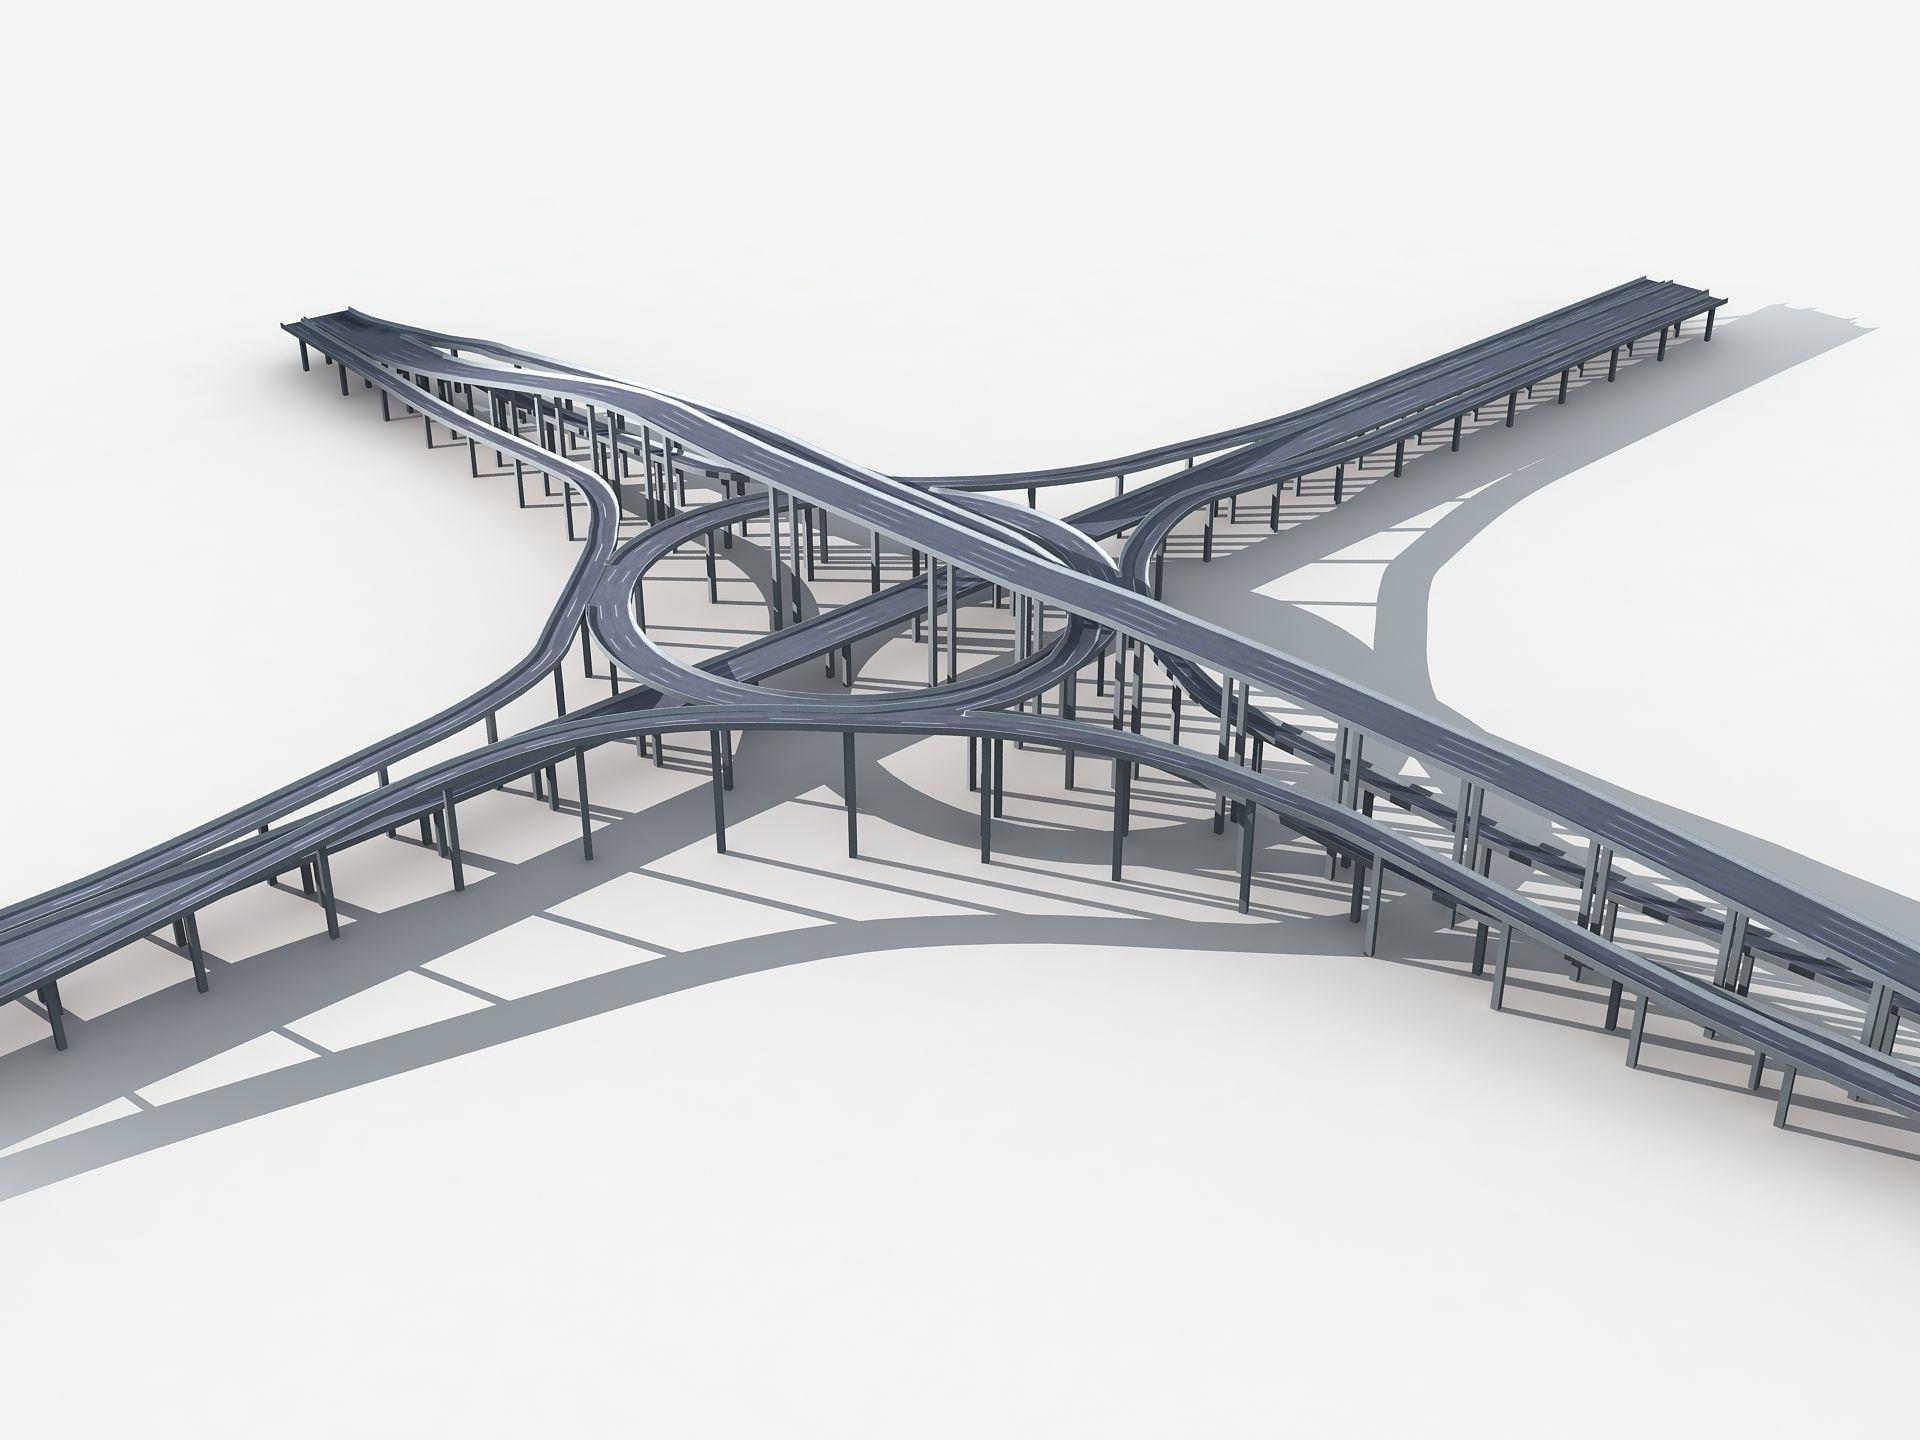 Highway Road Viaduct Flyover 05